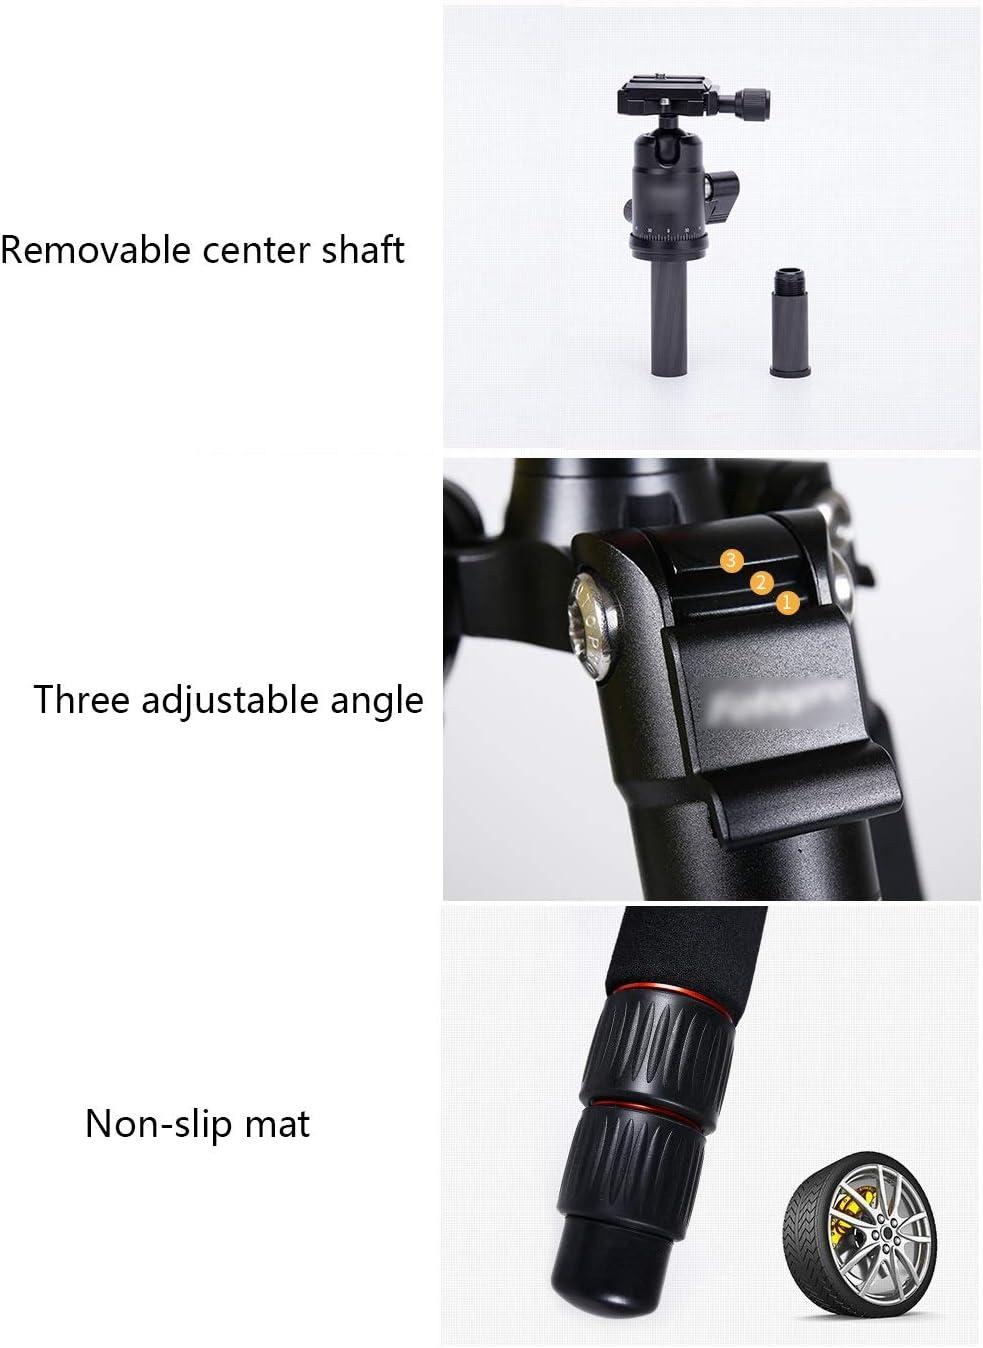 CJGXJZJ Mini Tripod Carbon Fiber//Aluminum Alloy Portable Outdoor Travel Ultra-Light SLR Micro Single Camera Small Professional Photography Camera Projector Tripod Bracket Multi-Style Optional